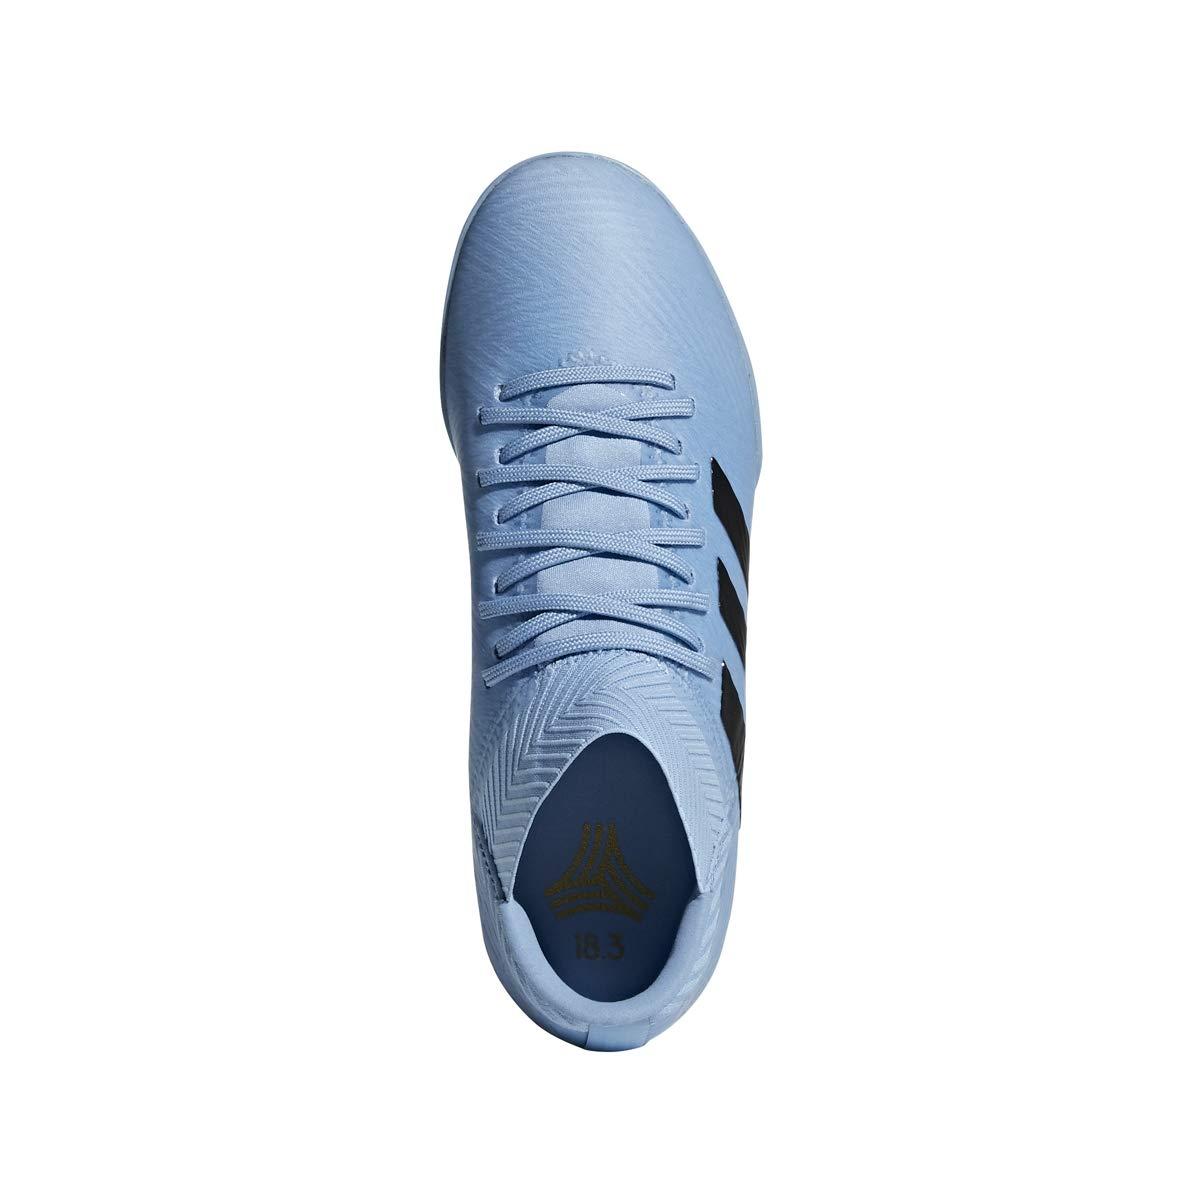 5e446f4559f adidas Originals Kids' Nemeziz Messi Tango 18.3 Tf J Running Shoe